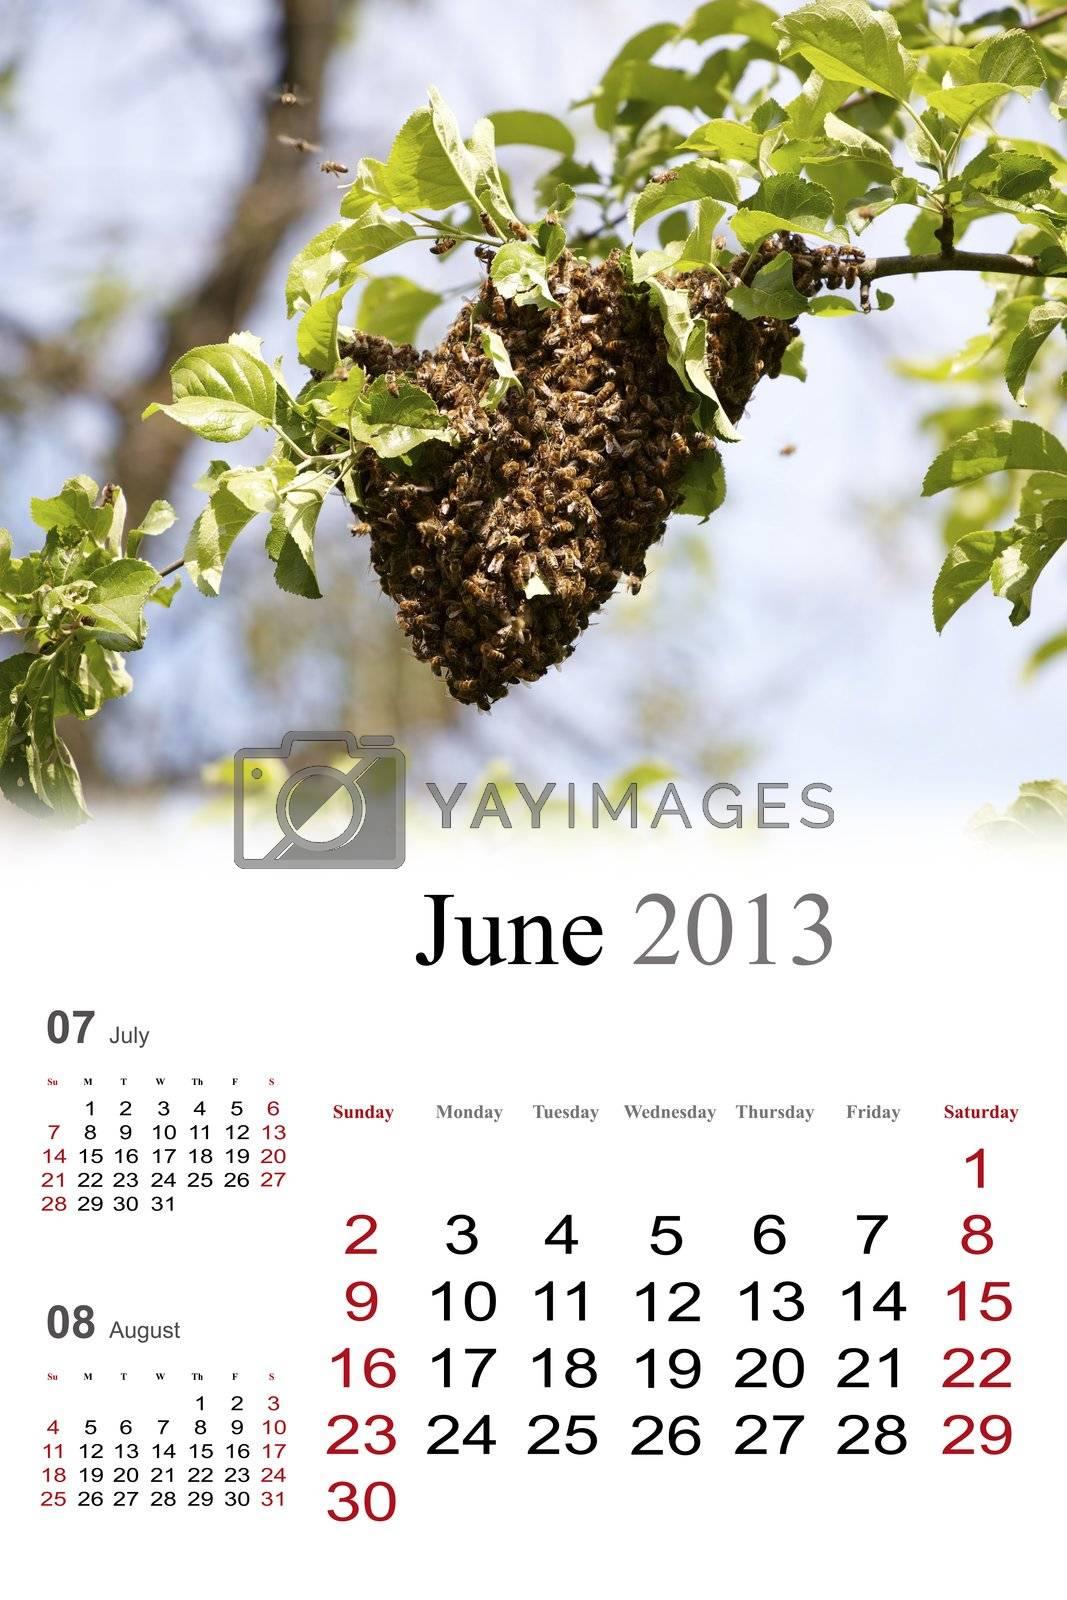 2013 Calendar. June